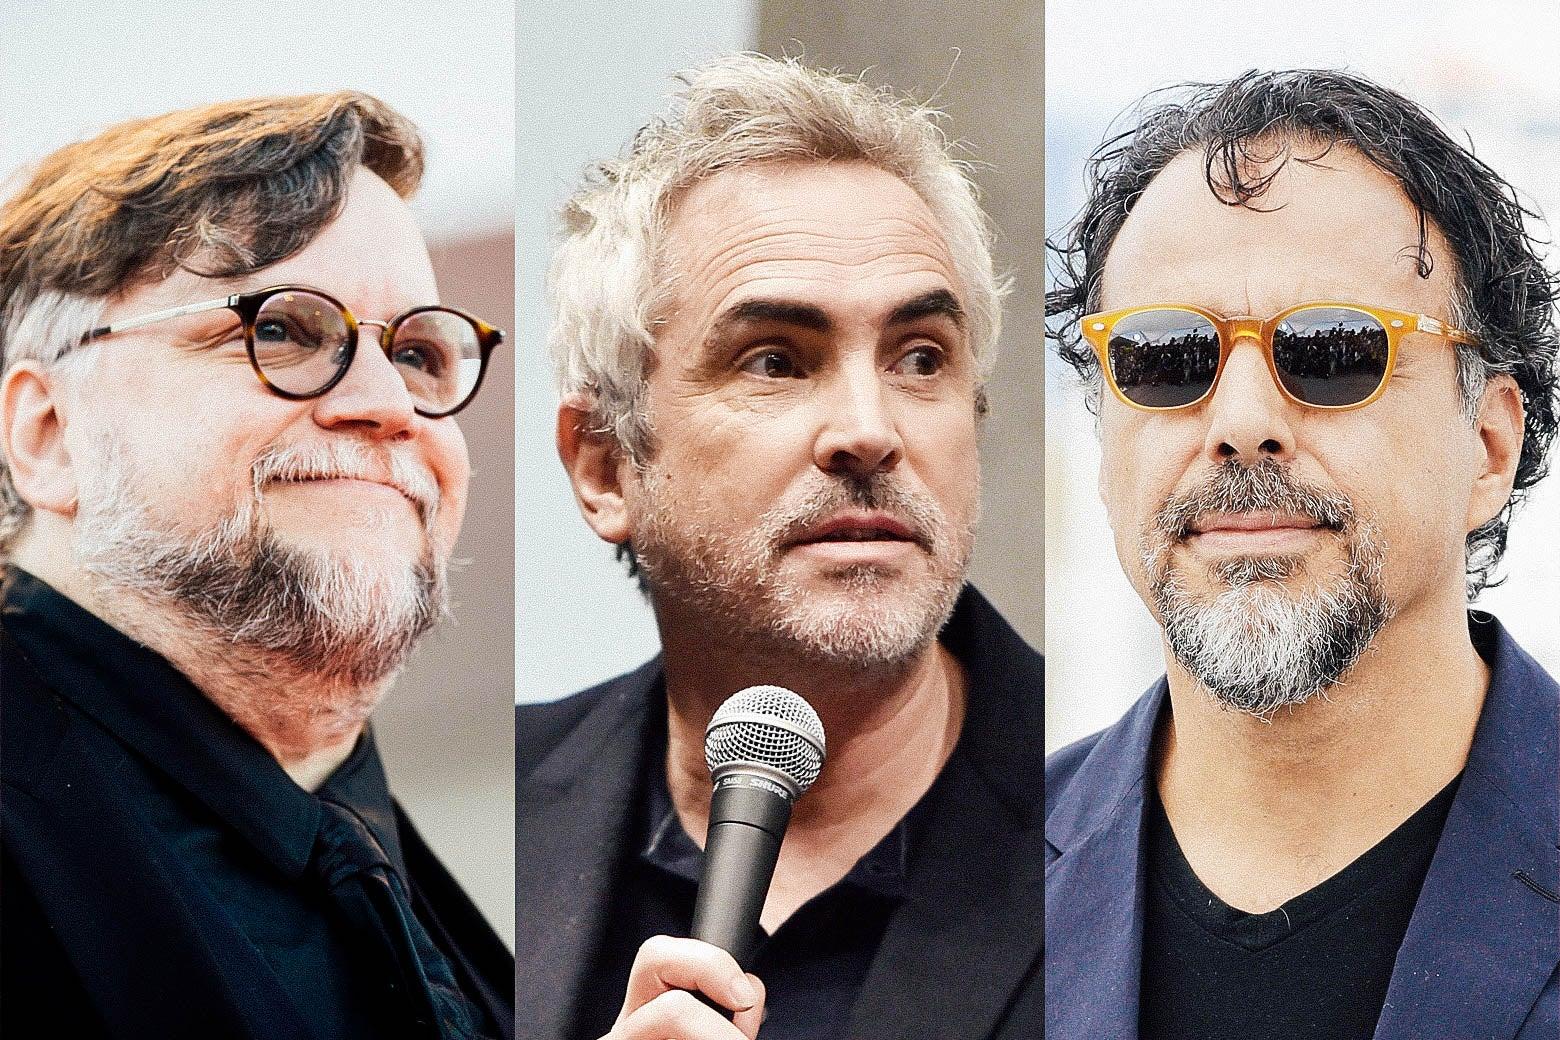 Guillermo del Toro, Alfonso Cuarón, and Alejandro González Iñárritu.